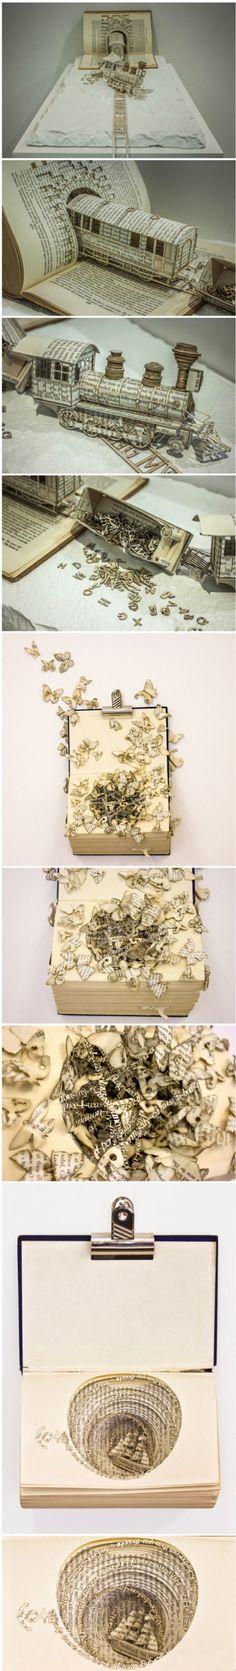 Papier amazing book sculpture